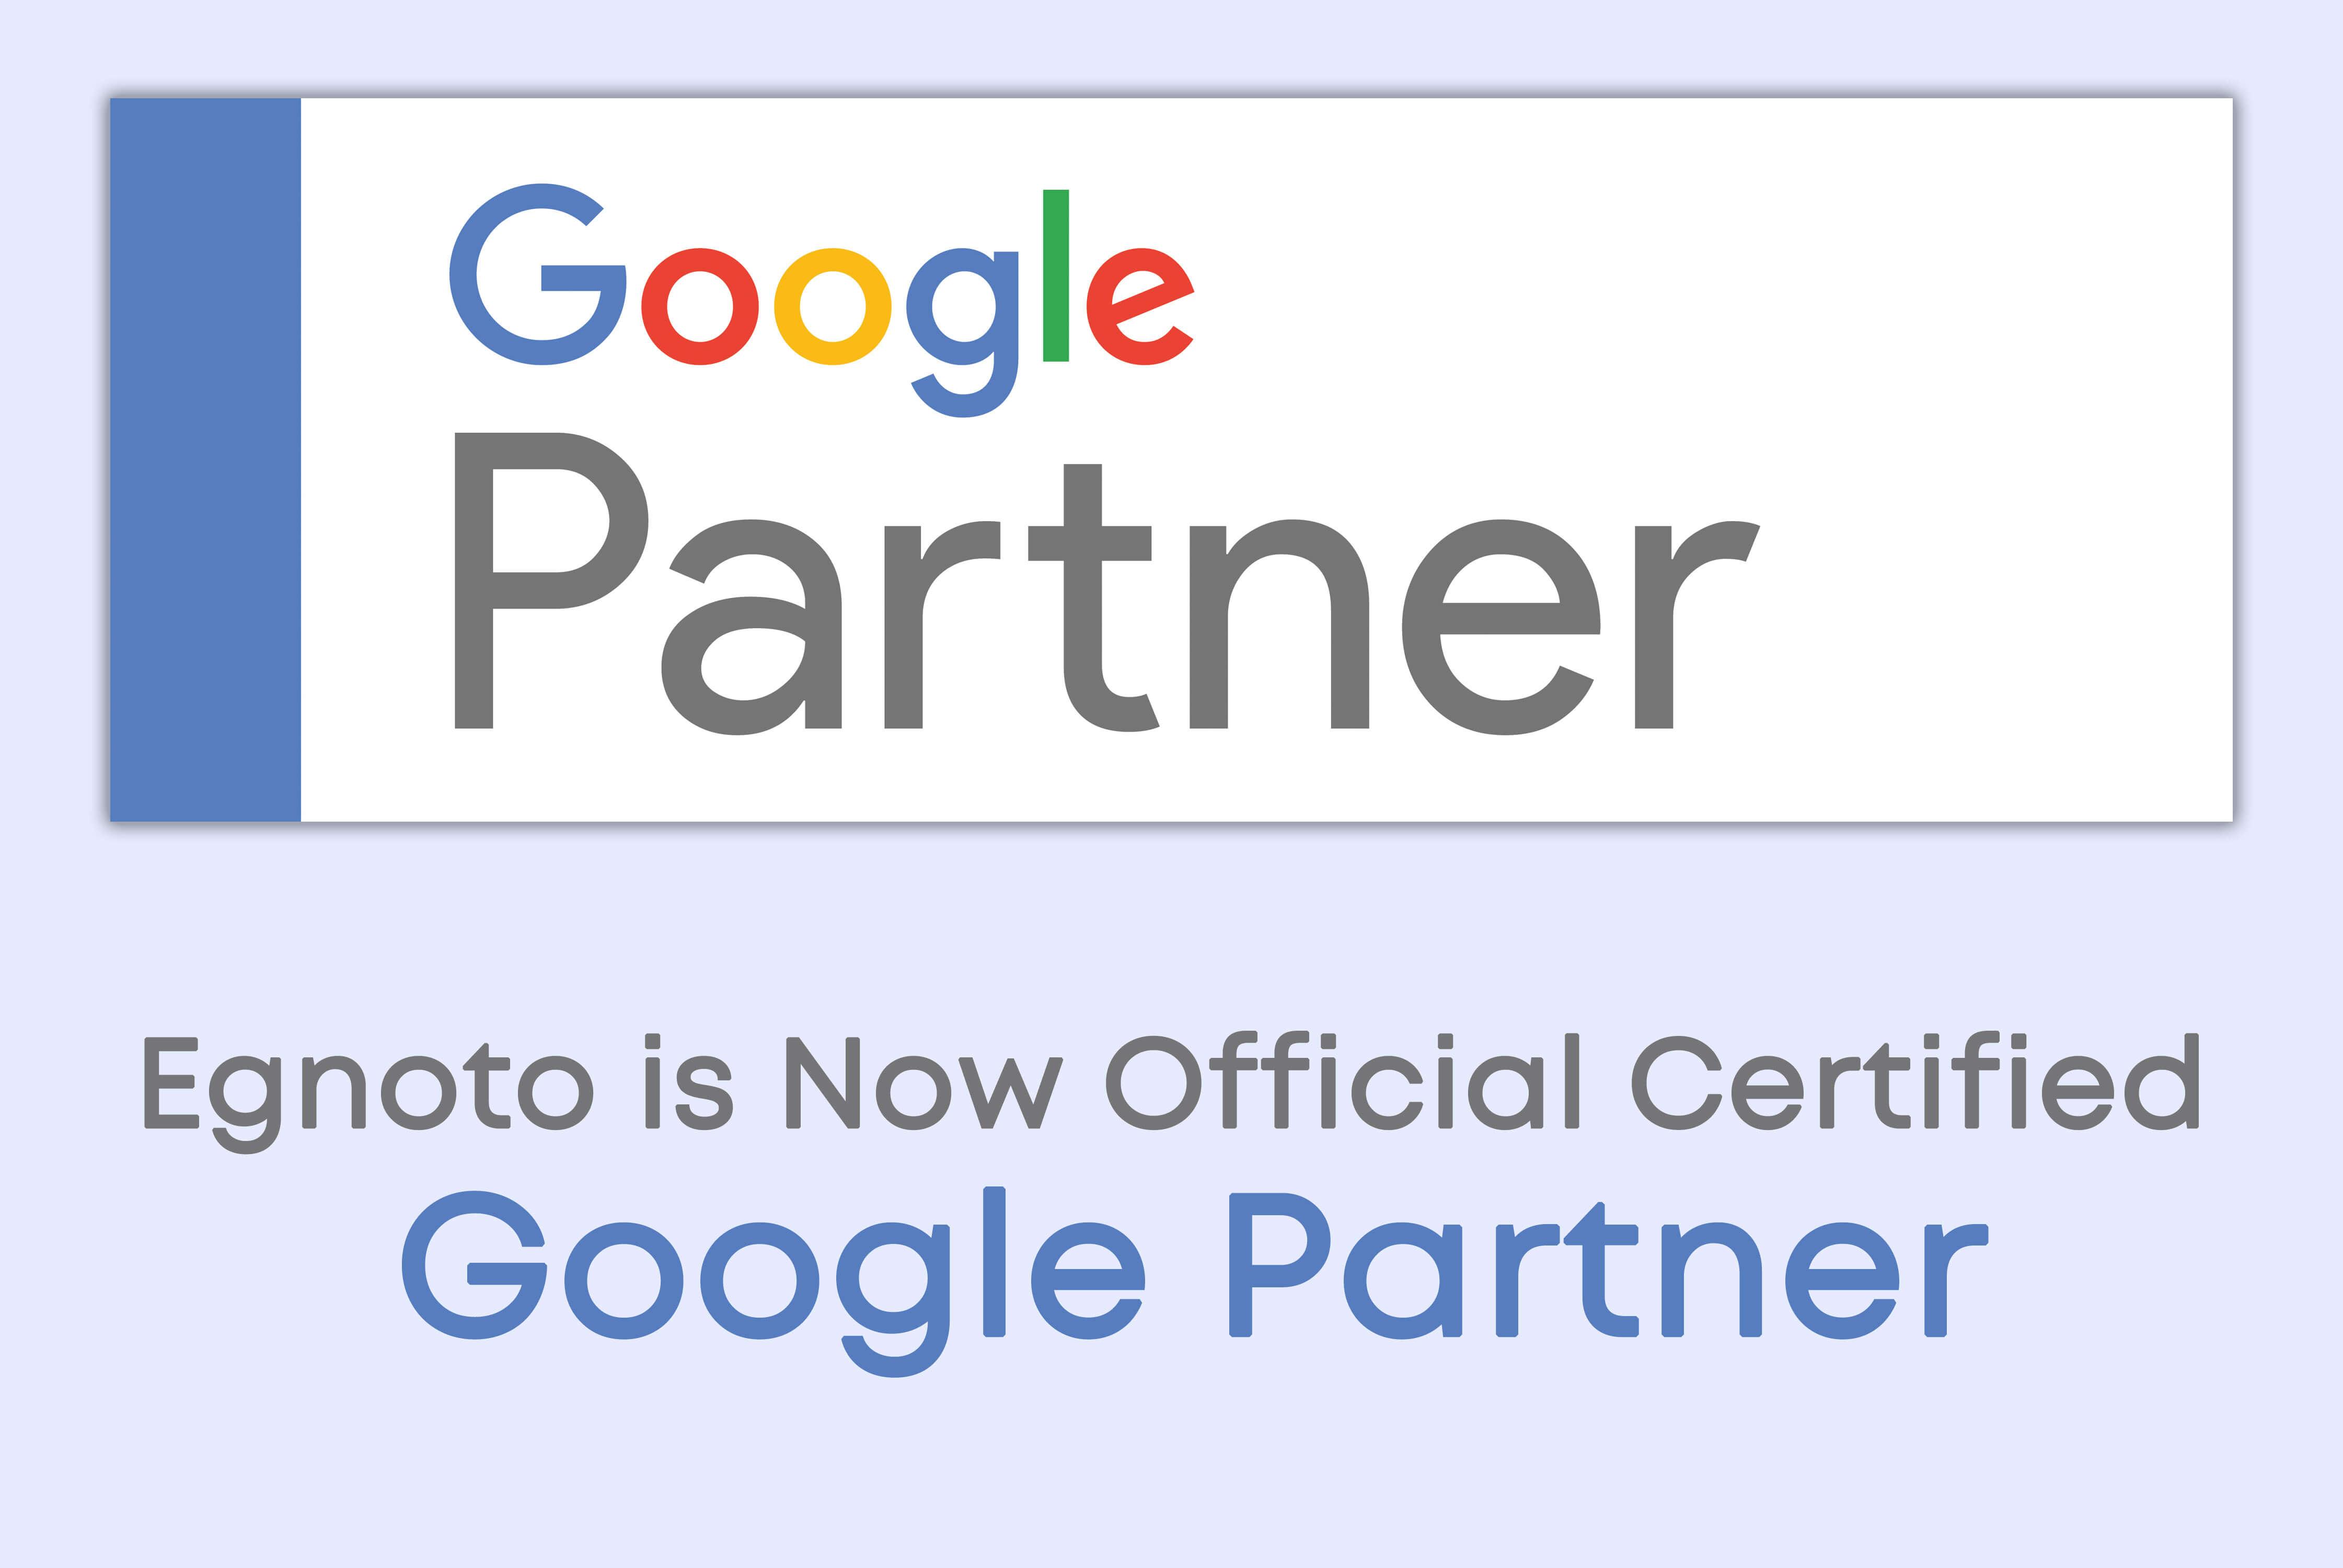 Egnoto - Official Certified Google Partner